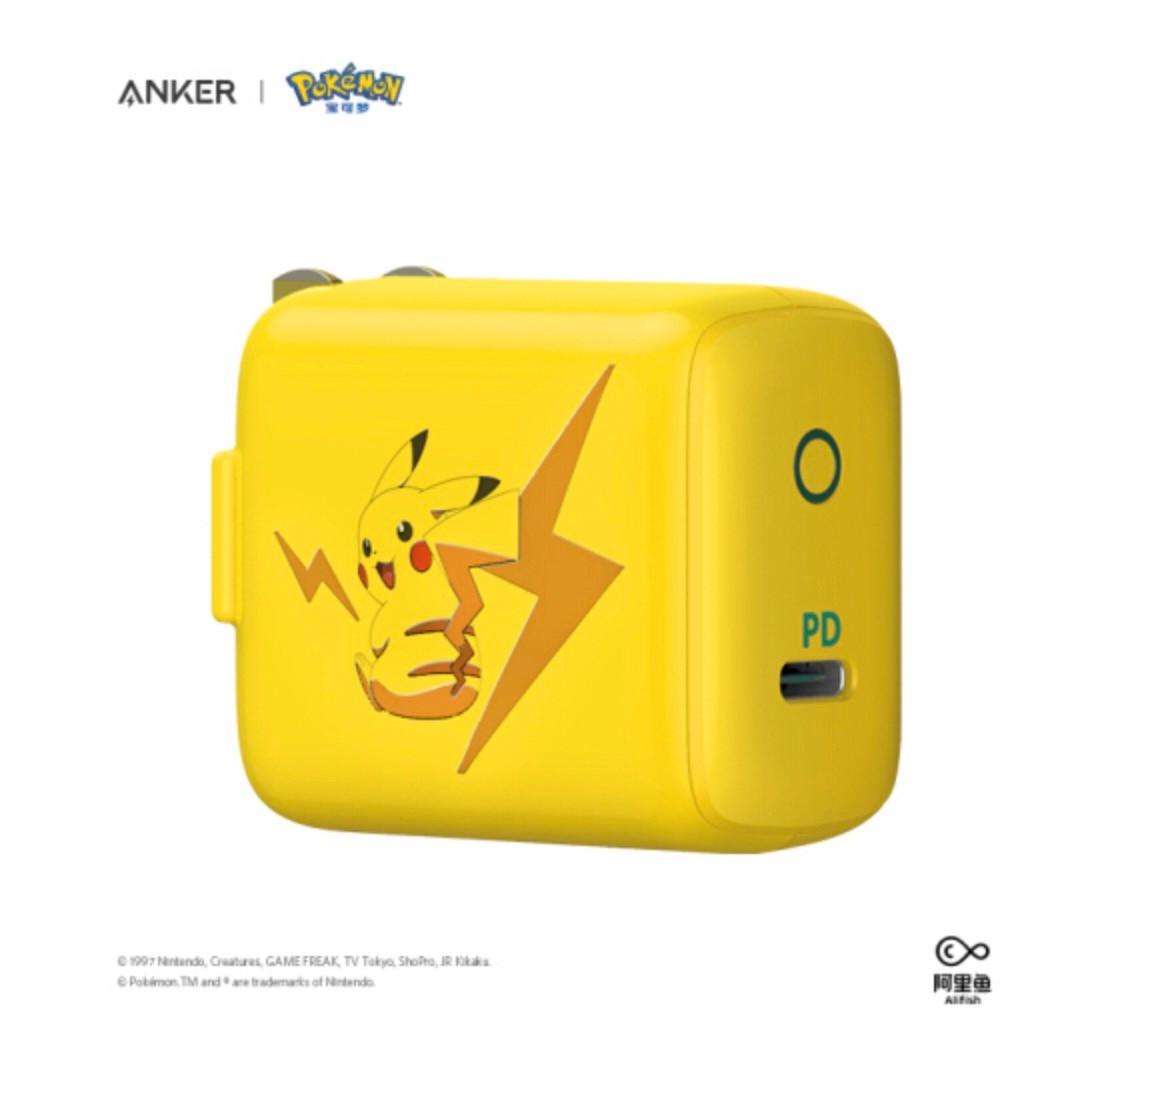 ANKER A2615 小闪电 充电器 30W 宝可梦联名系列